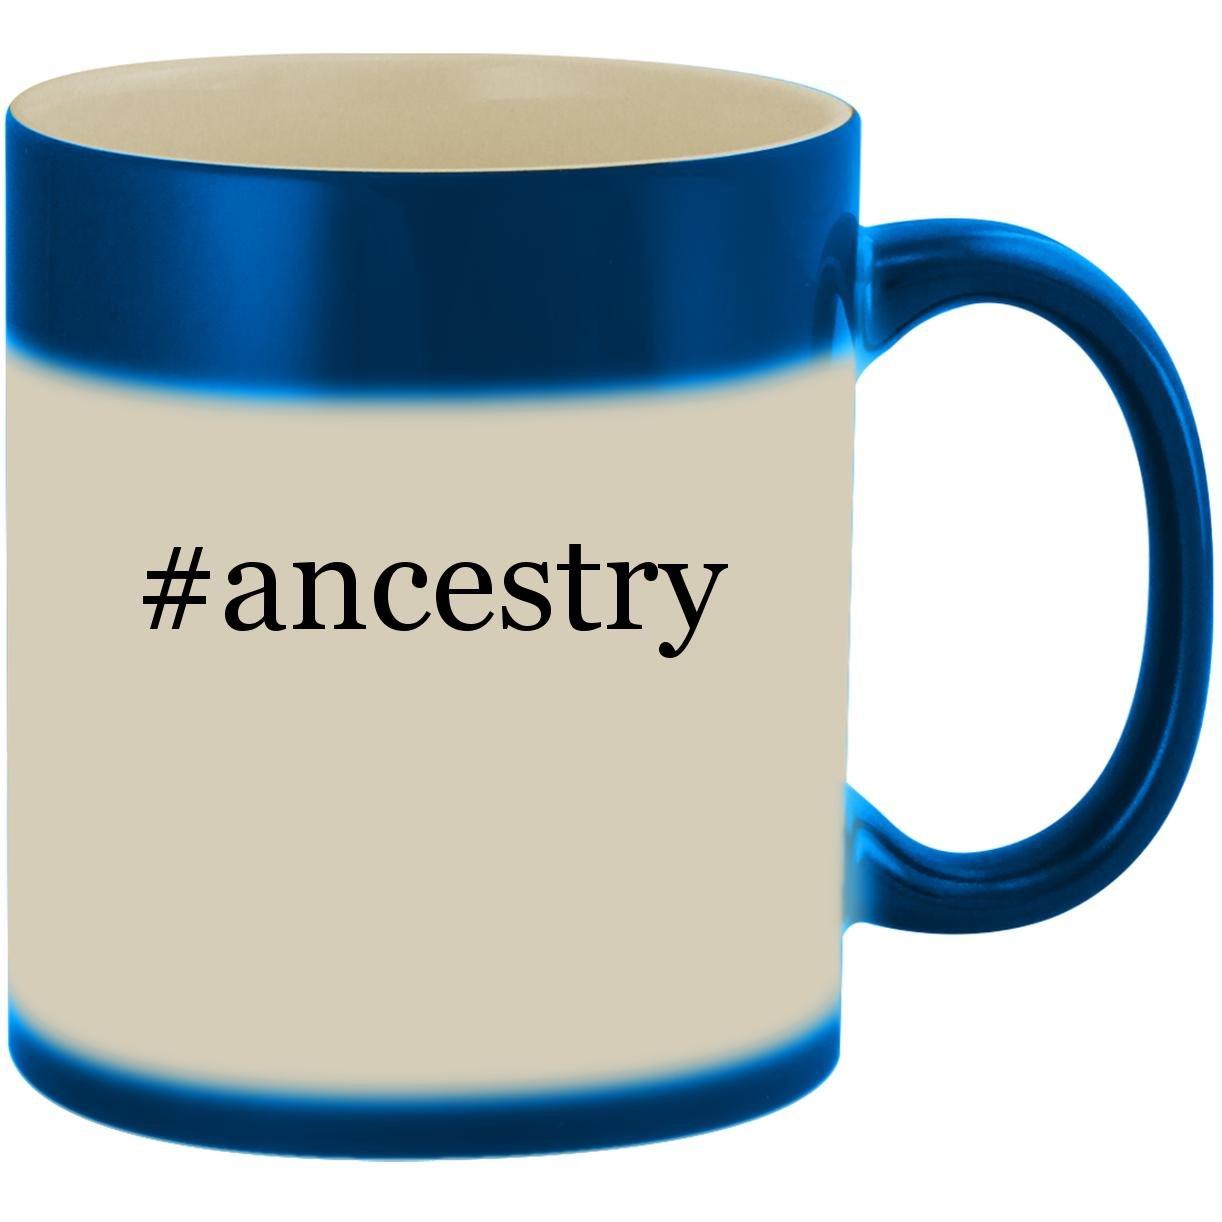 #ancestry - 11oz Ceramic Color Changing Heat Sensitive Coffee Mug Cup, Blue